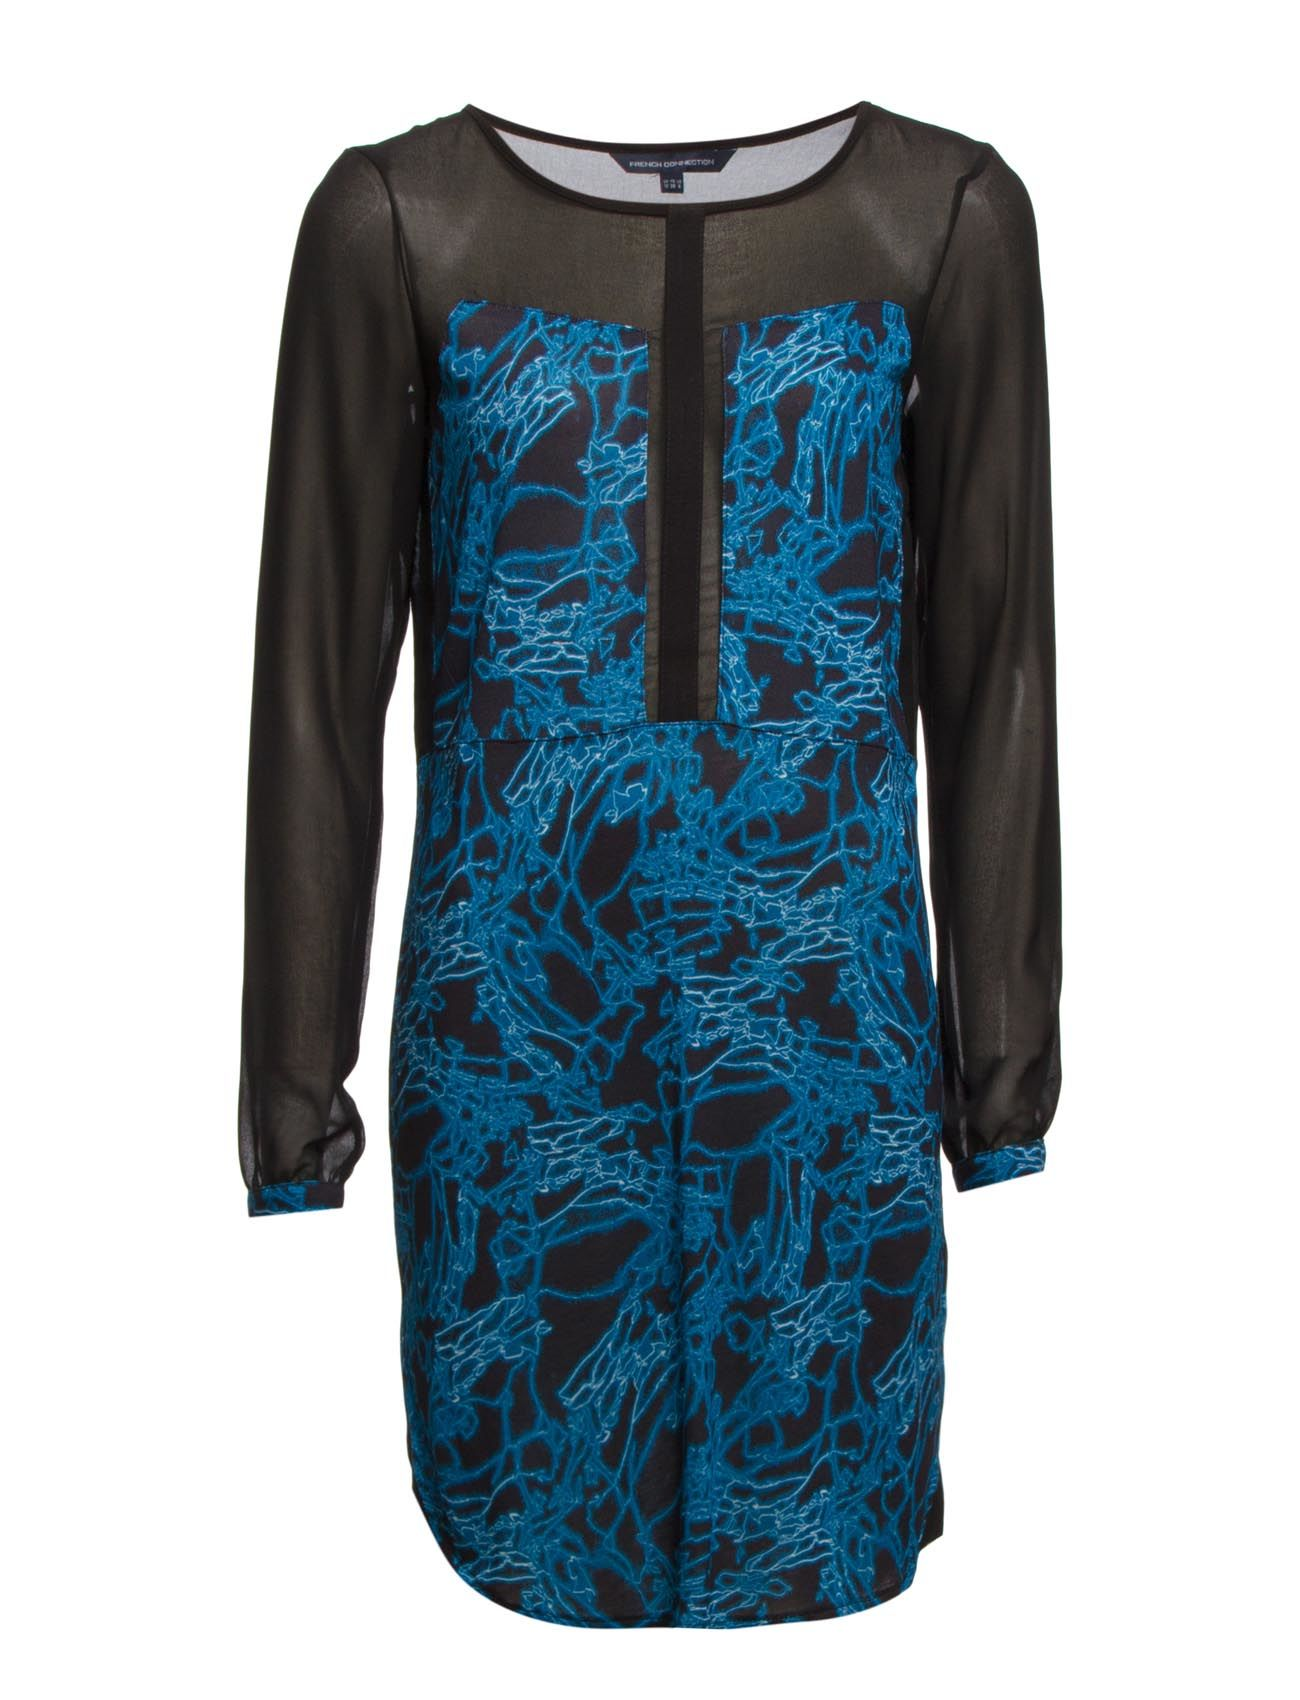 Stellar Ice Jersey Tunic Dress